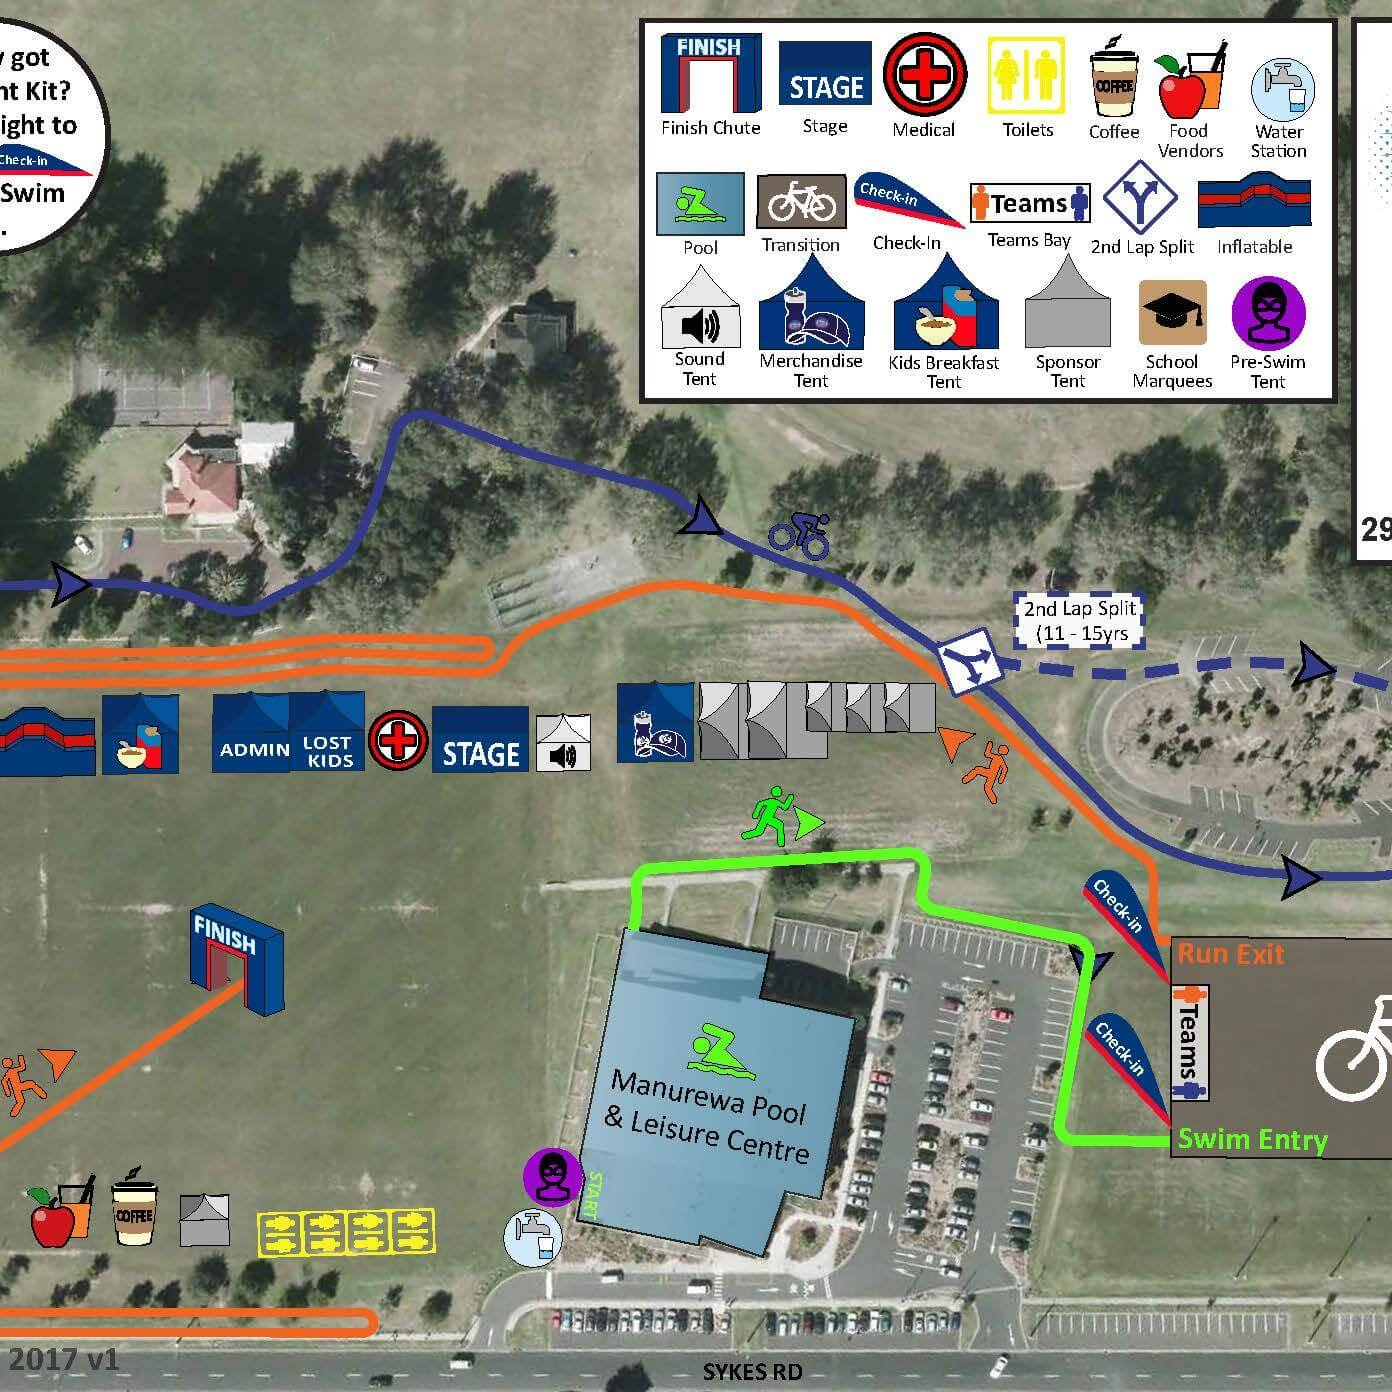 17-18 South Auckland - Village Map v1